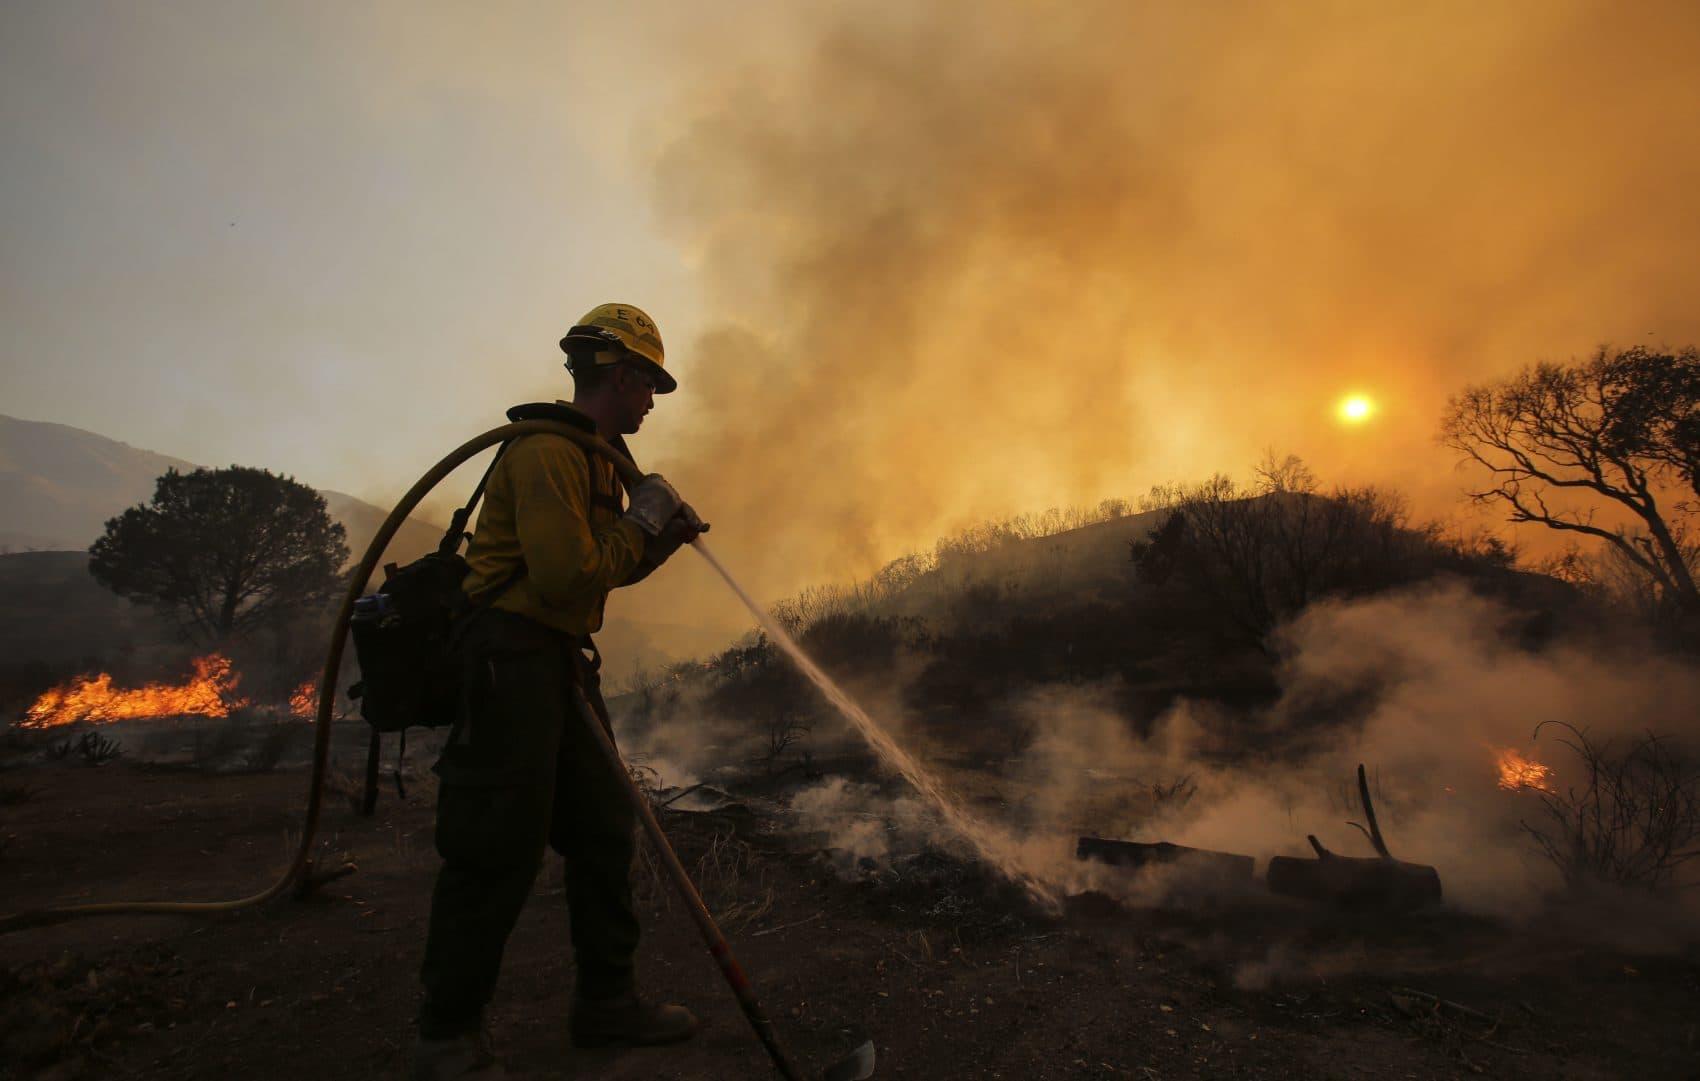 A firefighter battles a wildfire near Placerita Canyon Road in Santa Clarita, California, Sunday, July 24, 2016. (Ringo H.W. Chiu/AP)